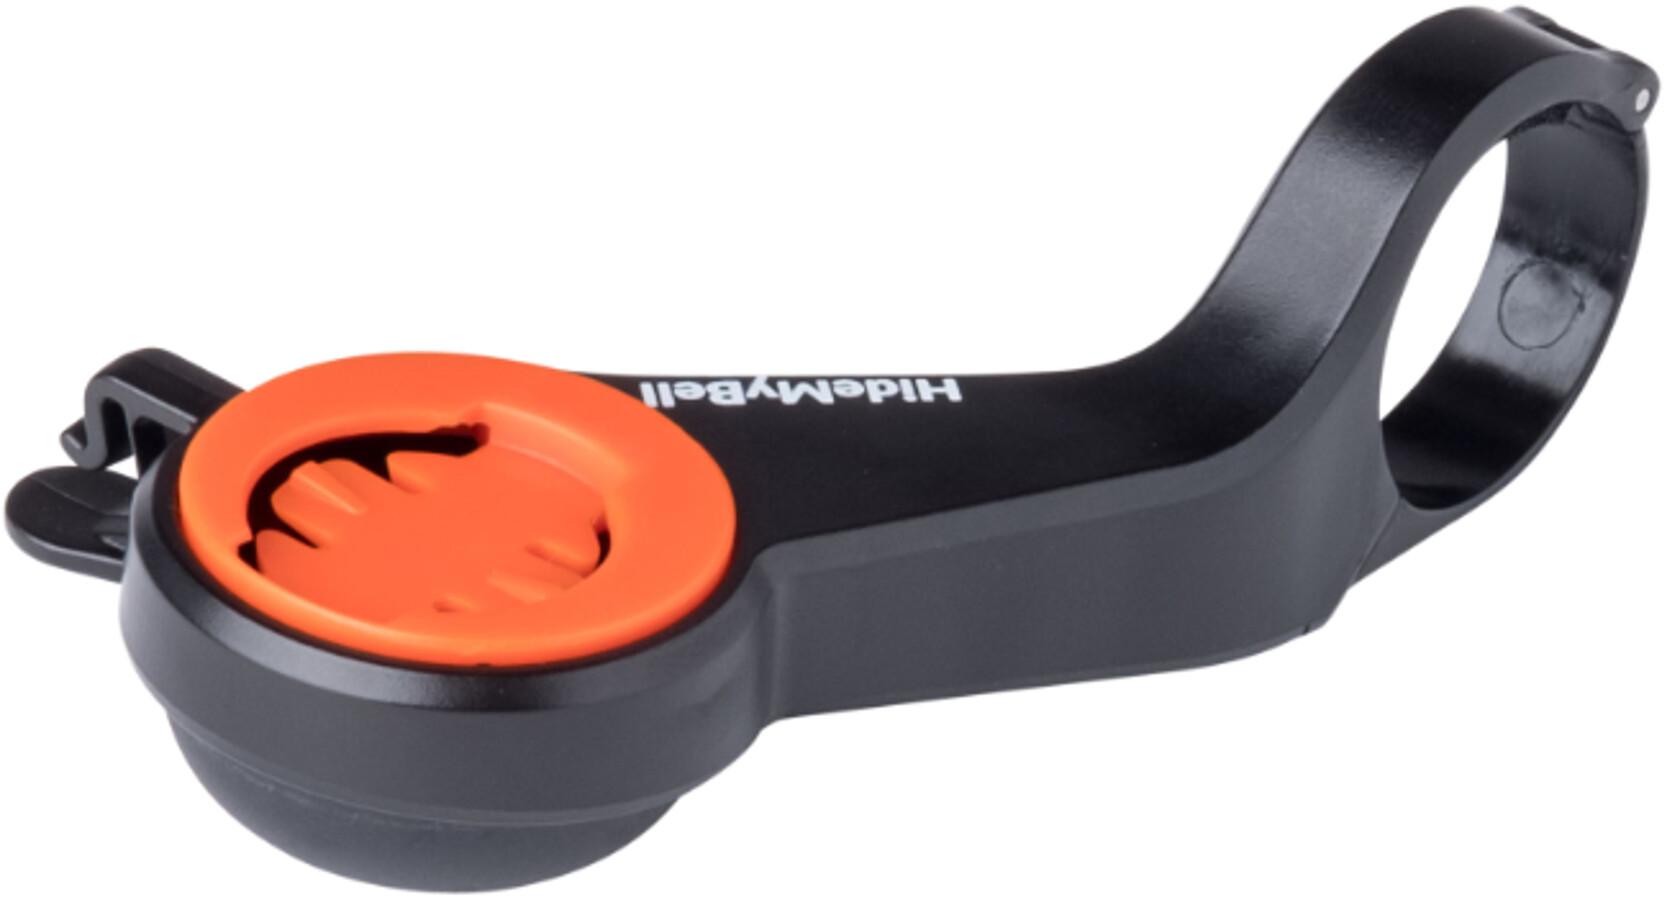 CloseTheGap Hide My Bell Styrmontering with integrated Bell Regular, black | Ringklokker